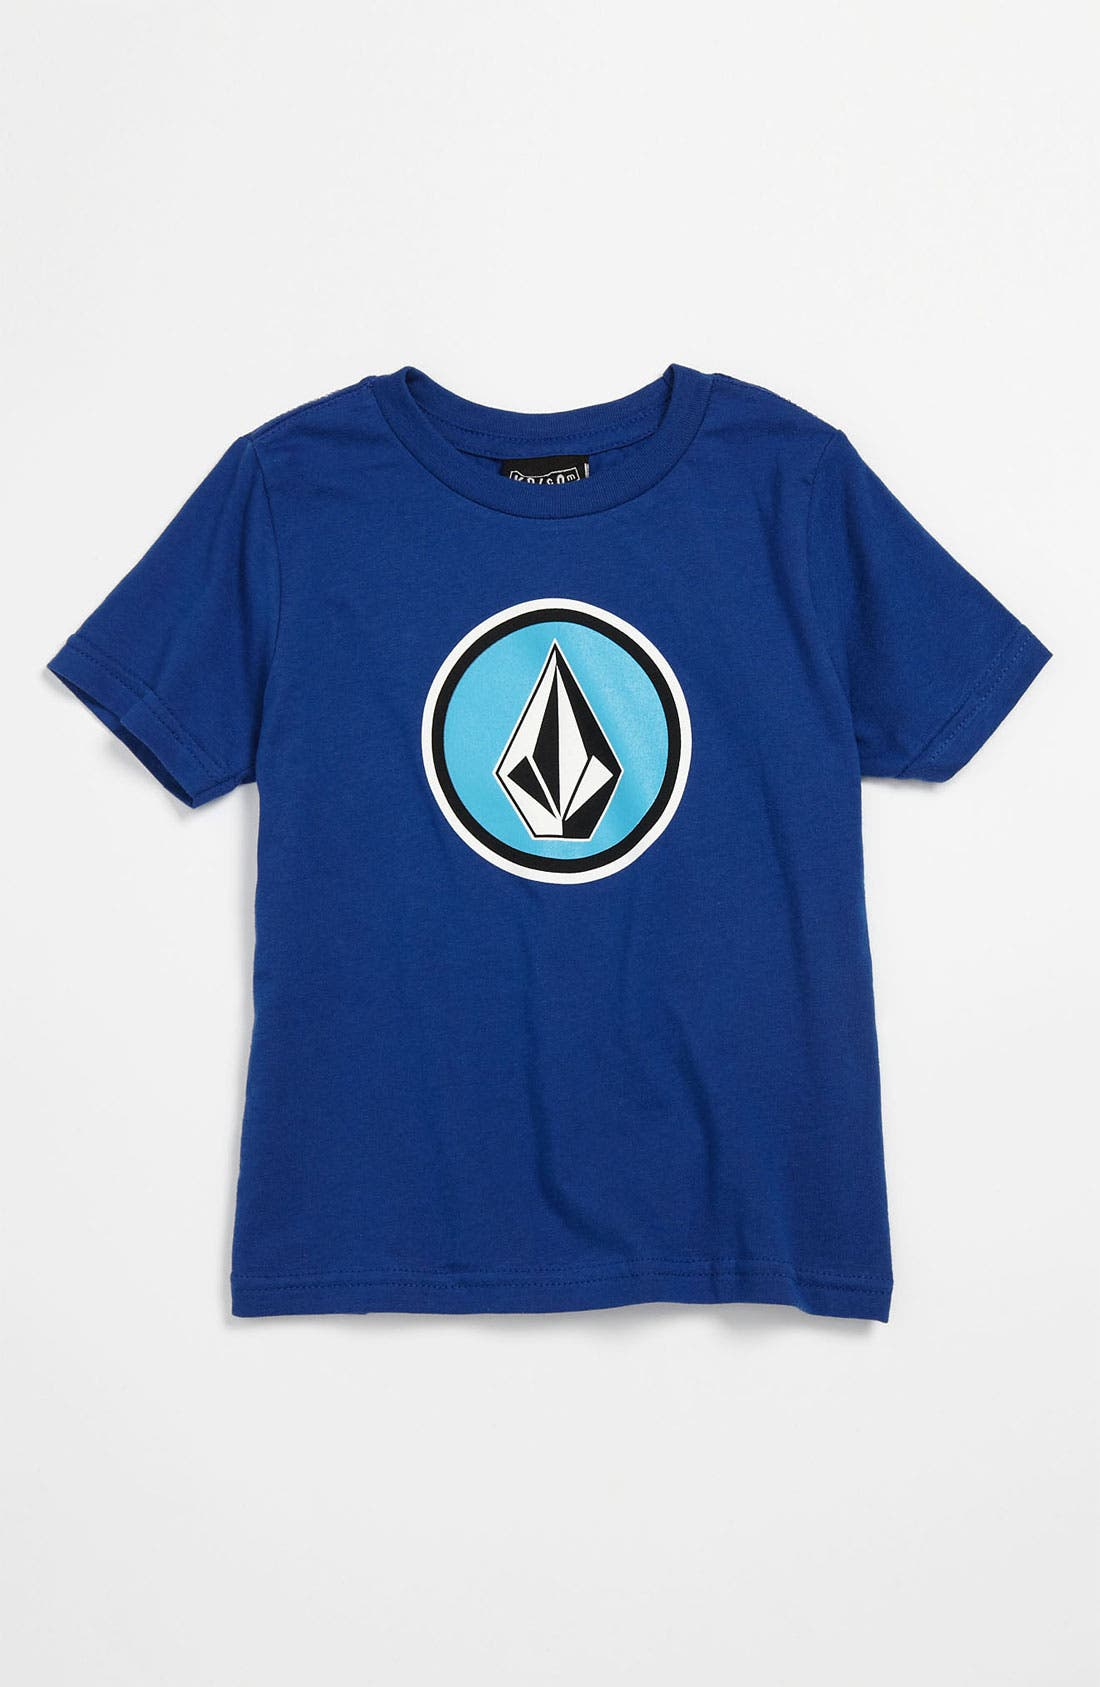 Alternate Image 1 Selected - Volcom 'Fanged Logo' T-Shirt (Toddler)